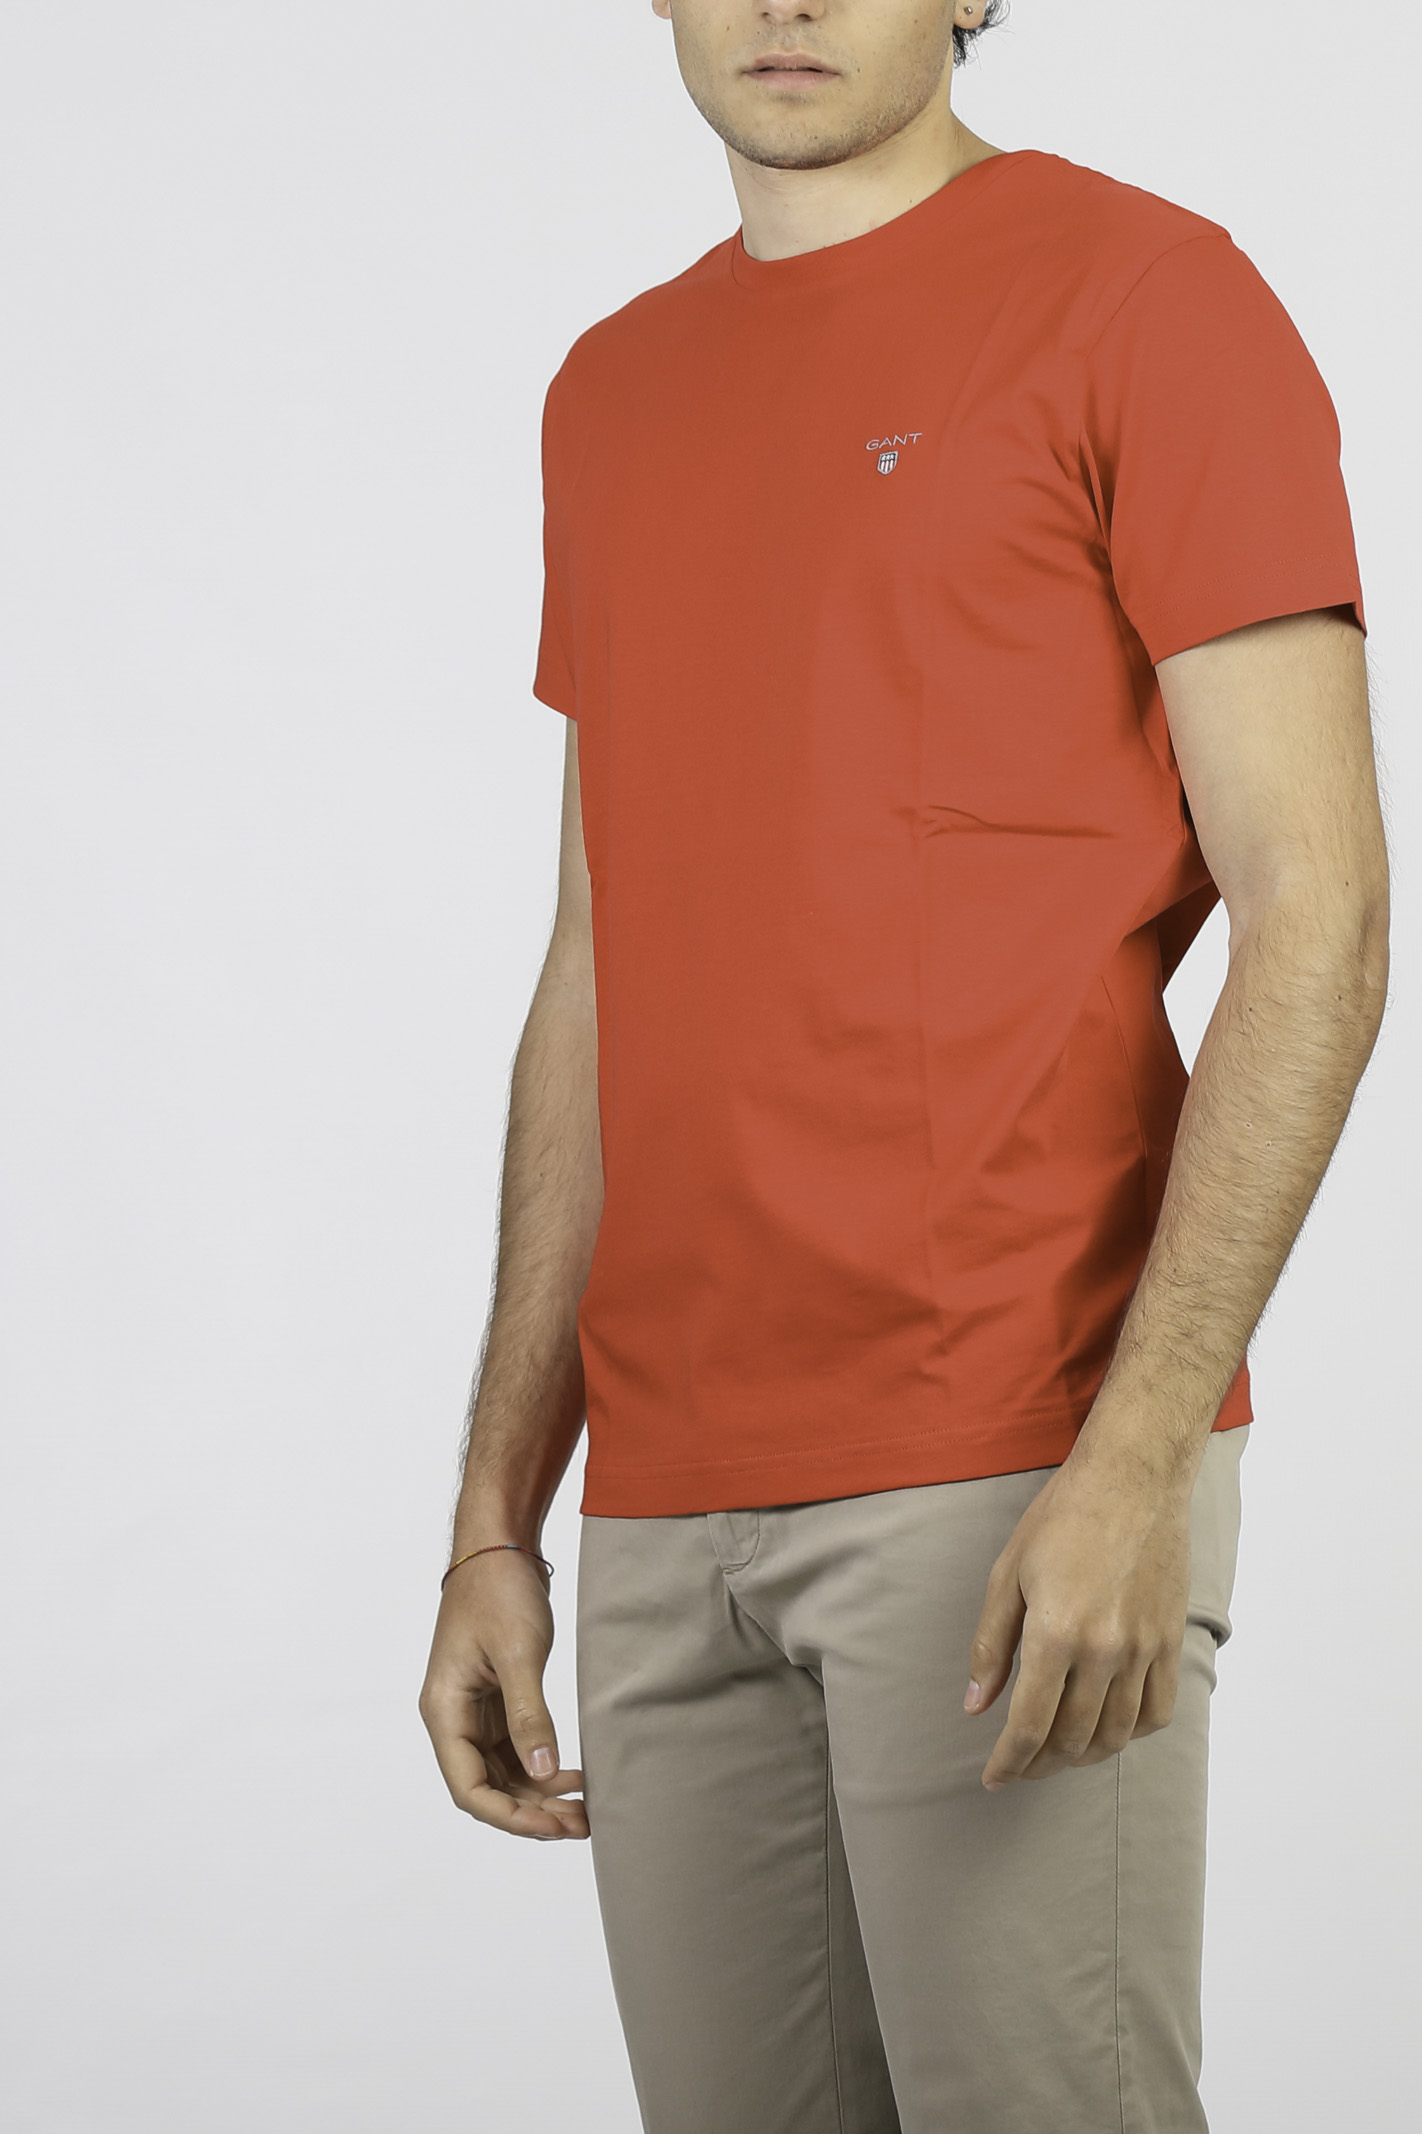 T-SHIRT IN COTONE GANT   T-shirt   234100620